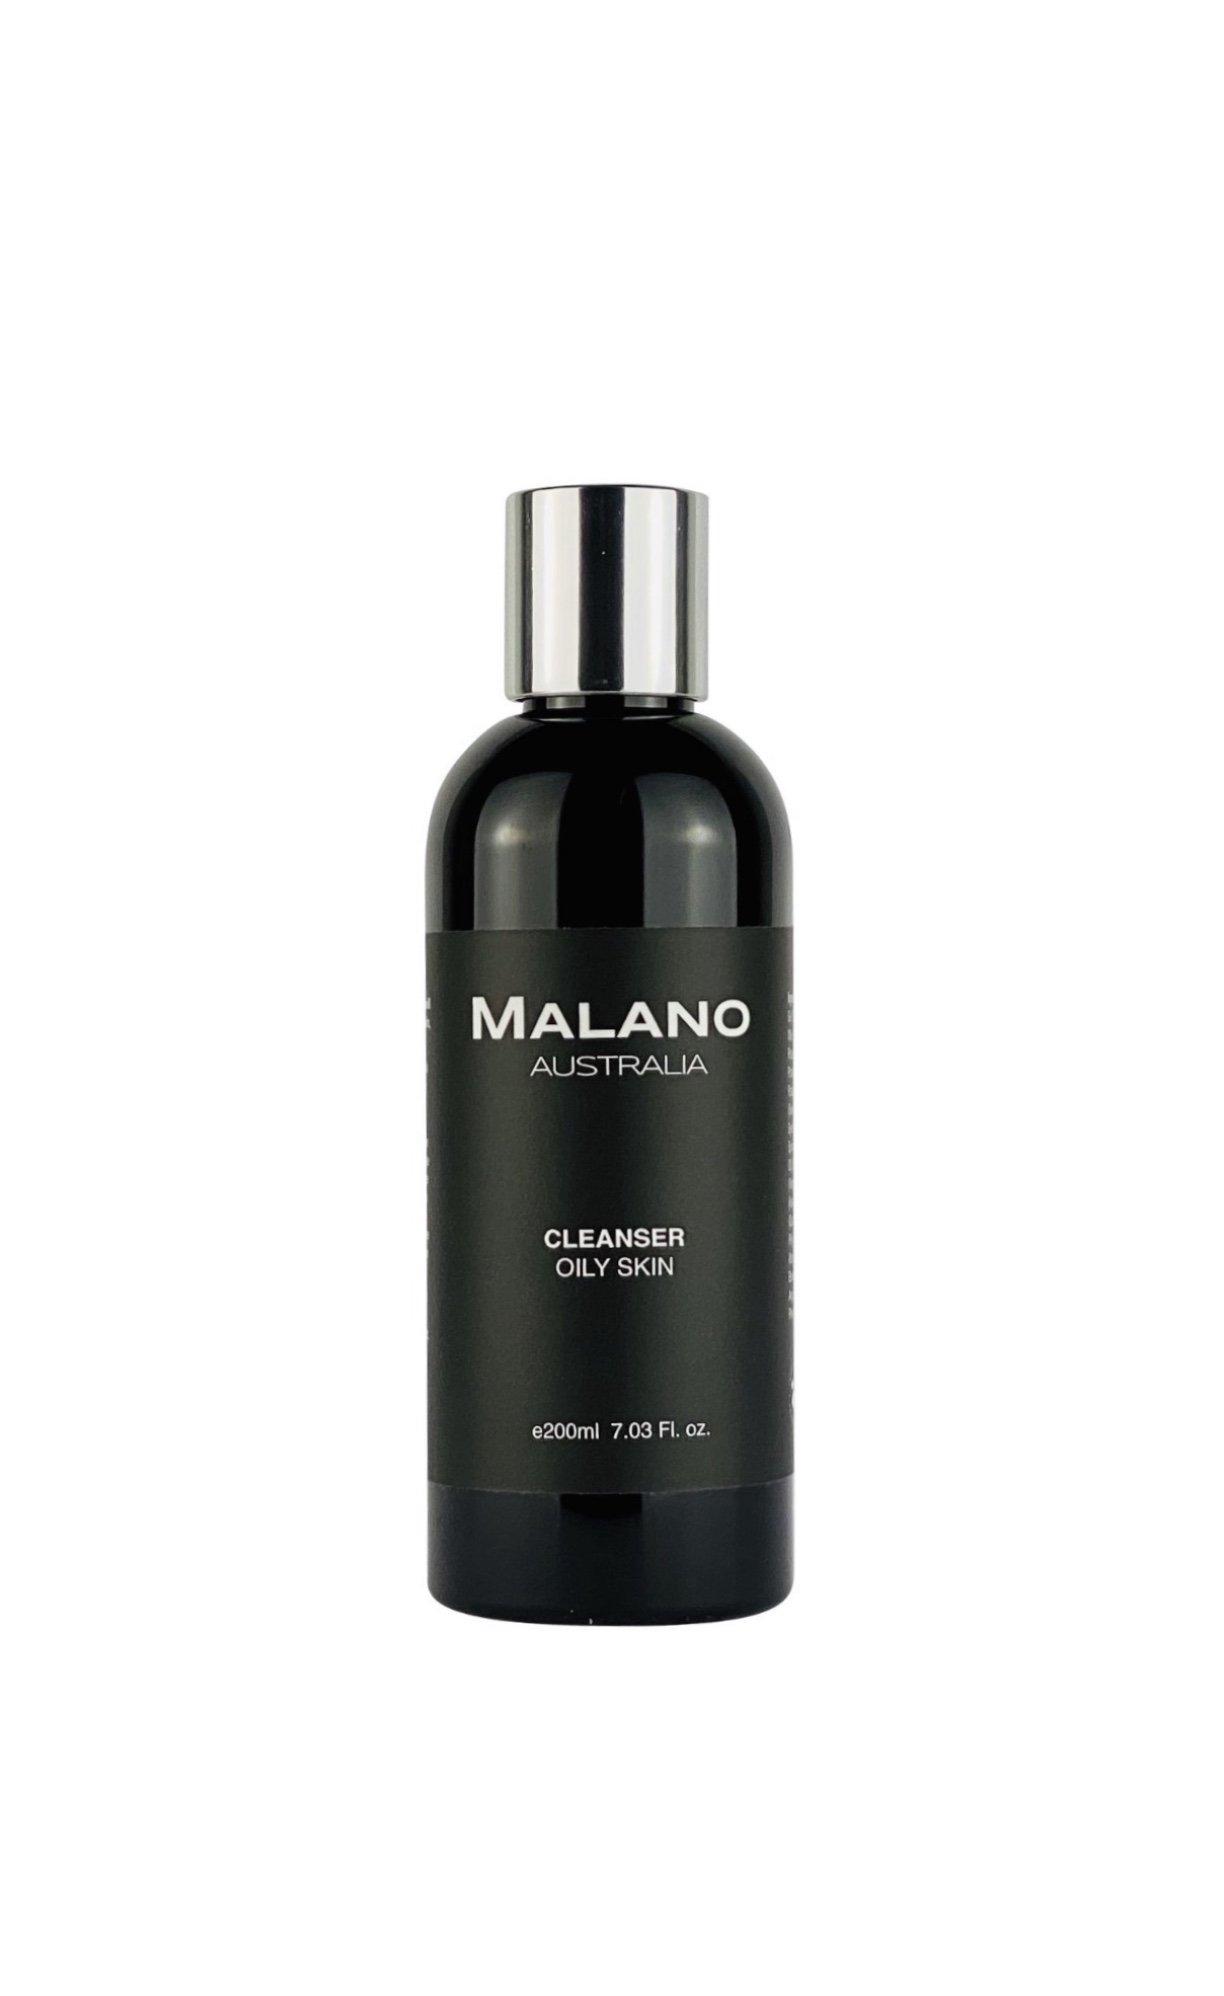 Cleanser Oily Skin